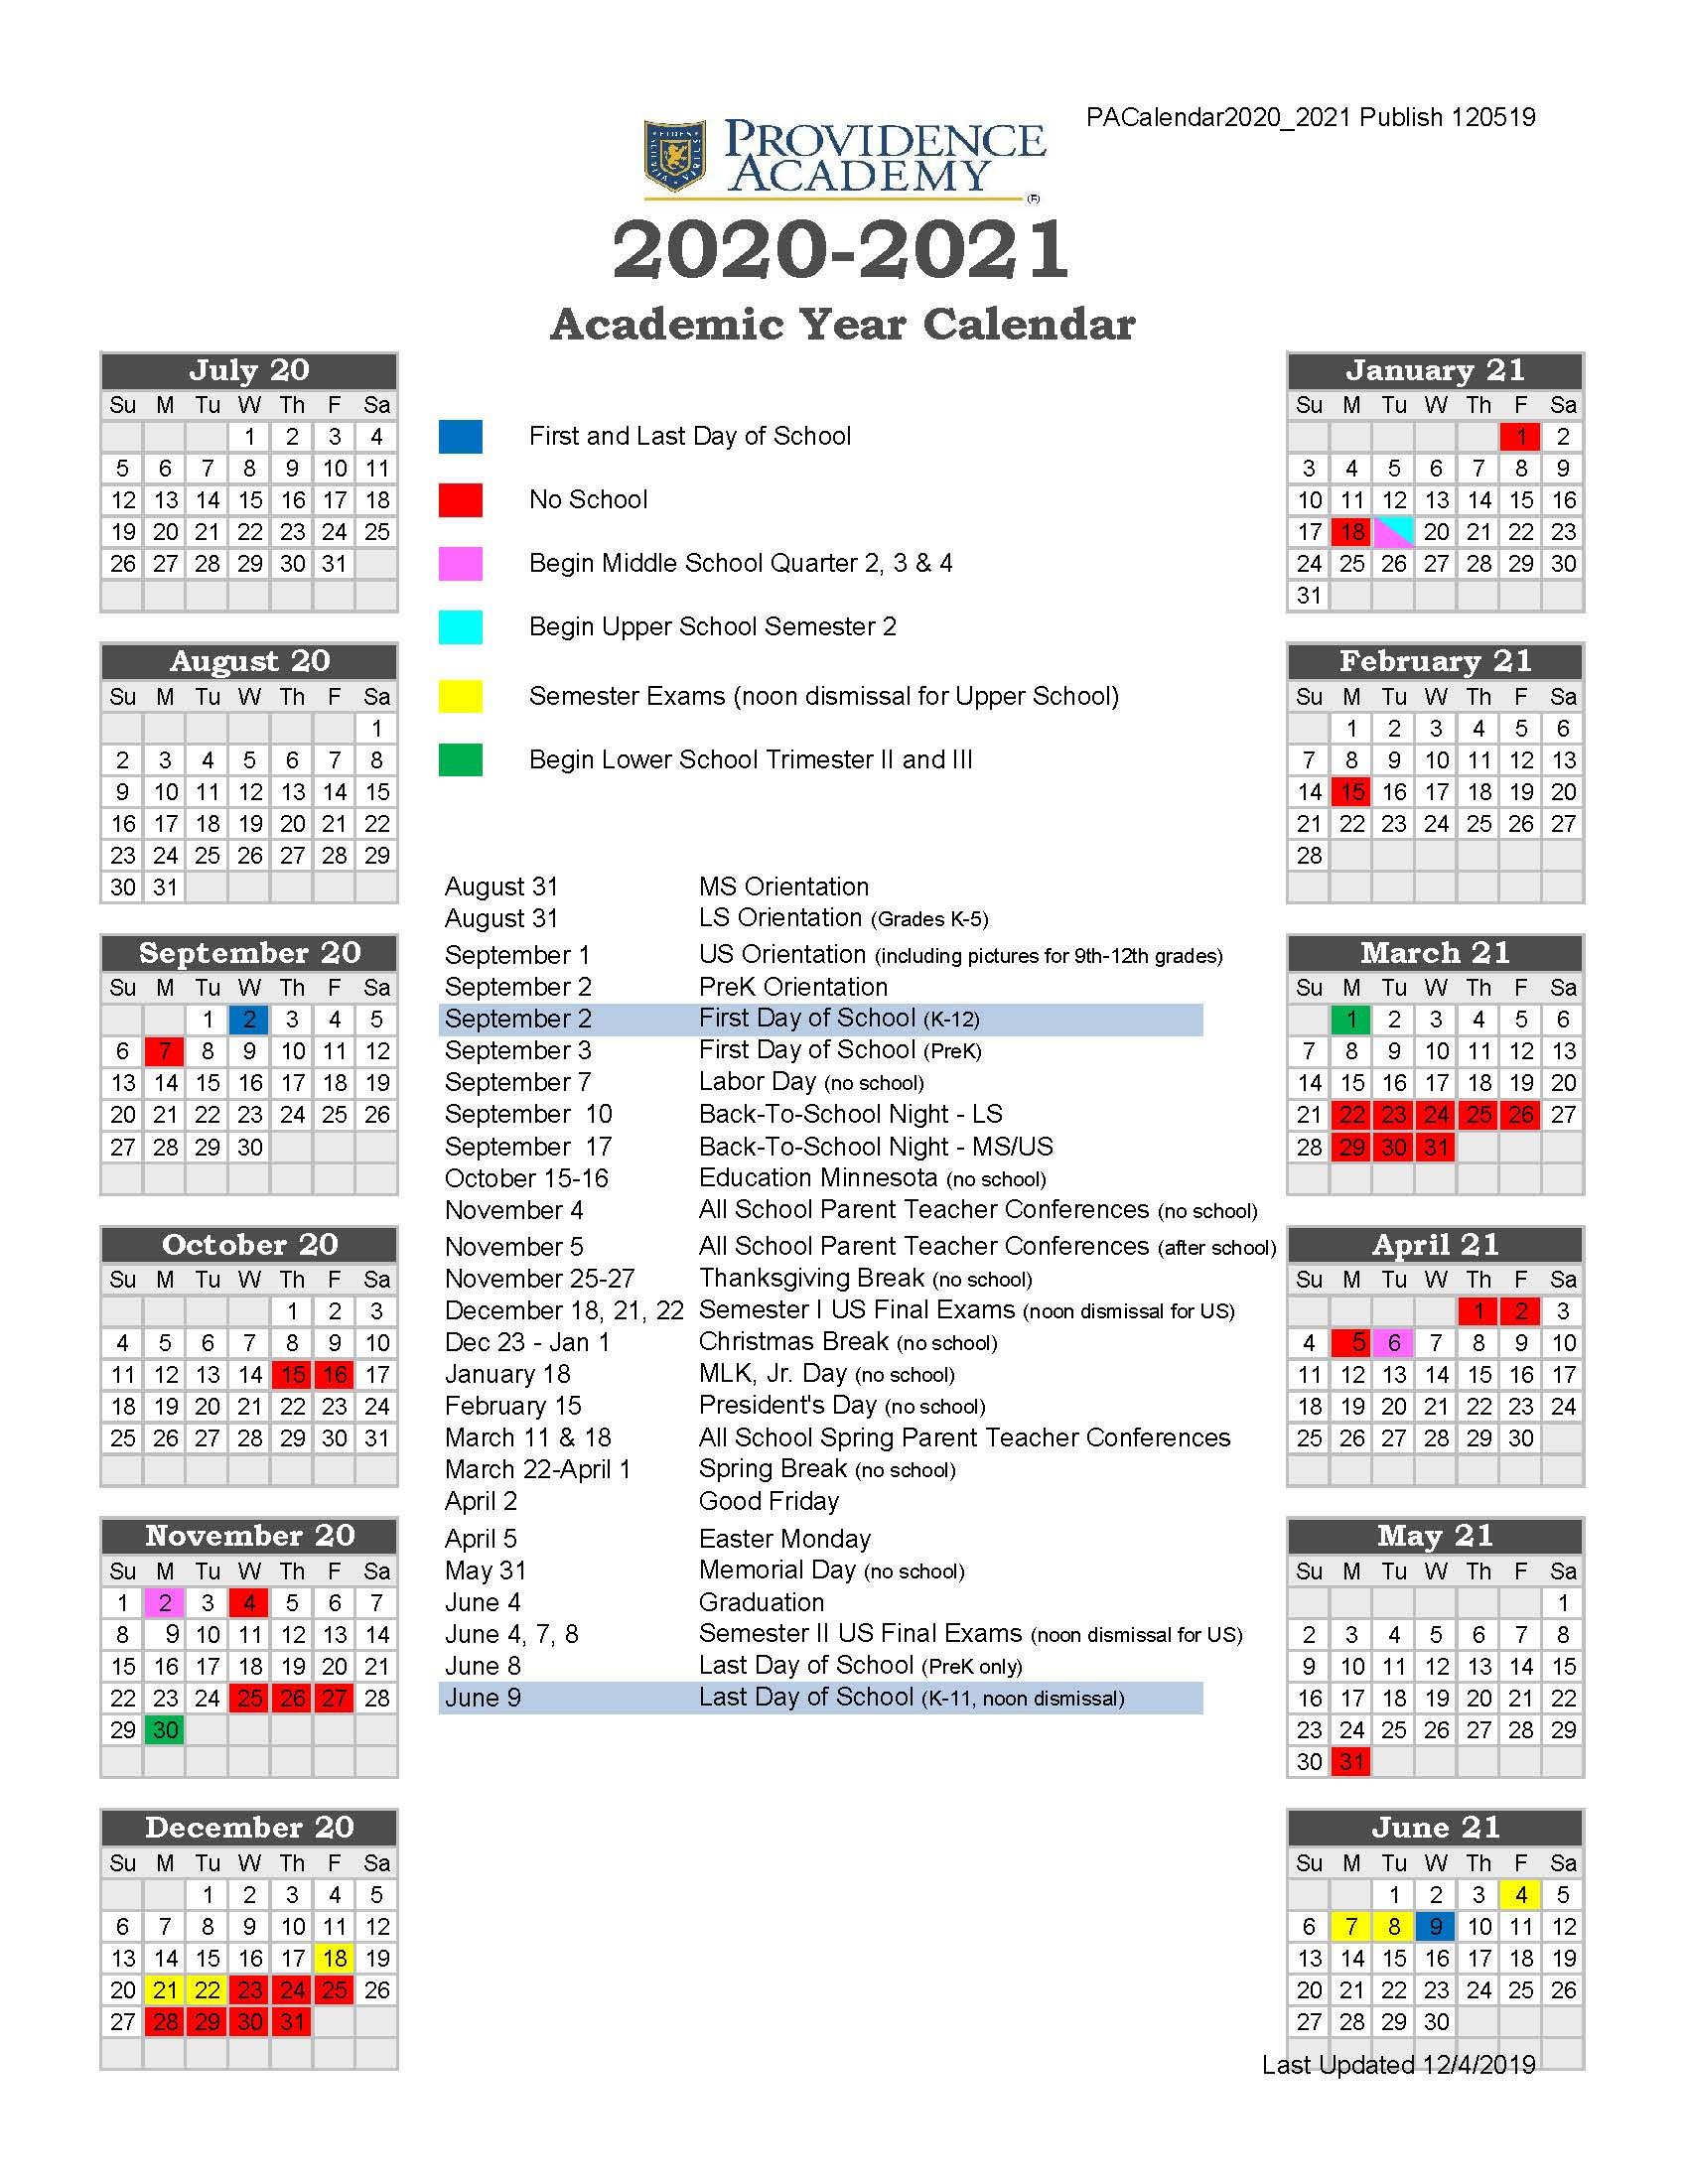 19-20_Providence-Academy-Academic-Calendar-2020-2021 intended for U Of M Twin Cities 2020-2021 Calendar